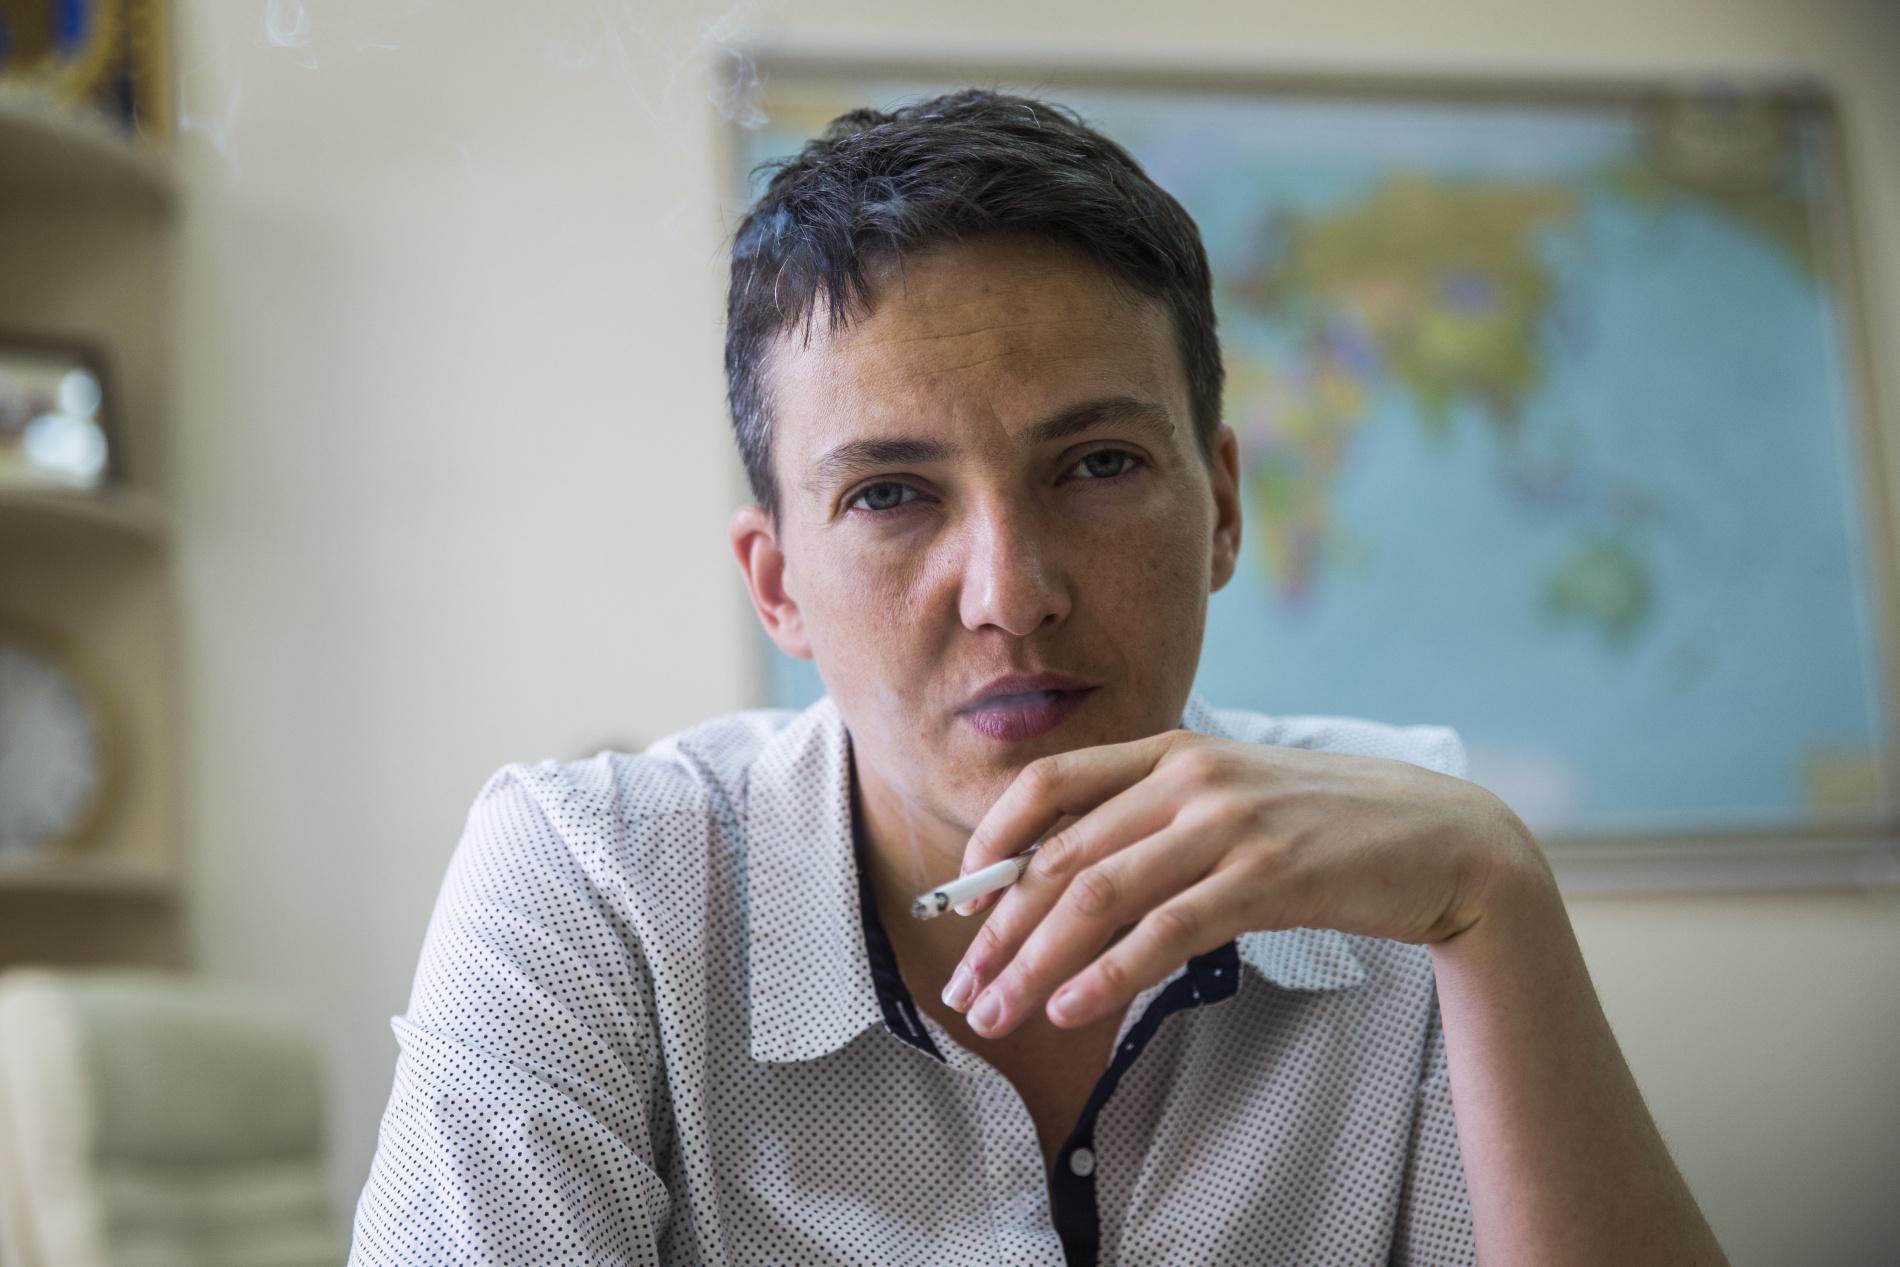 Общежитие Савченко: в каких условиях раньше она жила (видео)